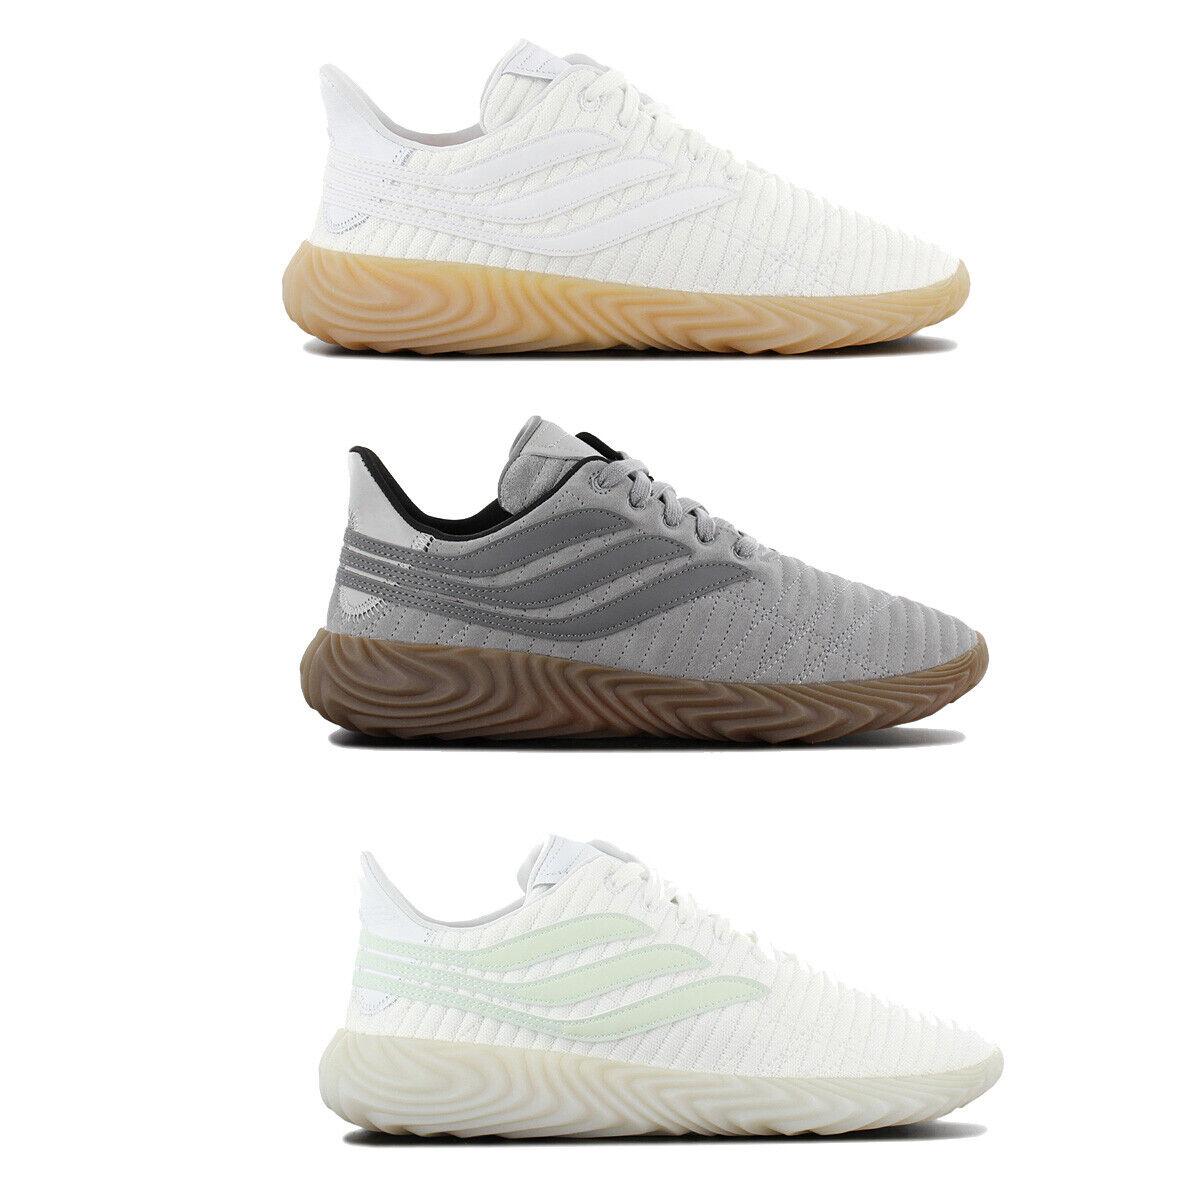 Adidas Originals Sobakov Turnschuhe Herren Schuhe Schuhe Schuhe Sportschuhe Freizeit Turnschuhe fd3